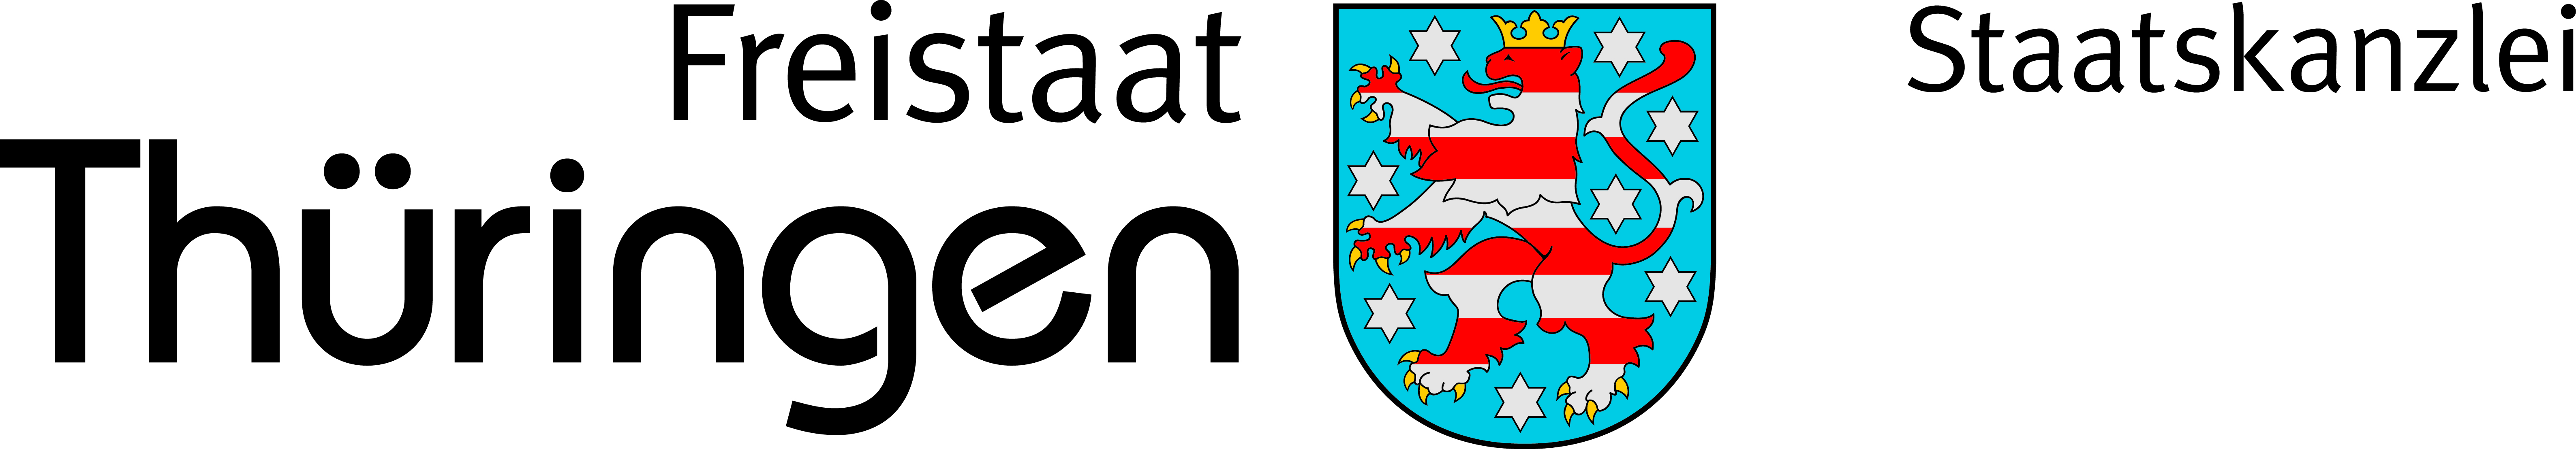 logo_Staatskanzlei_Thueringen